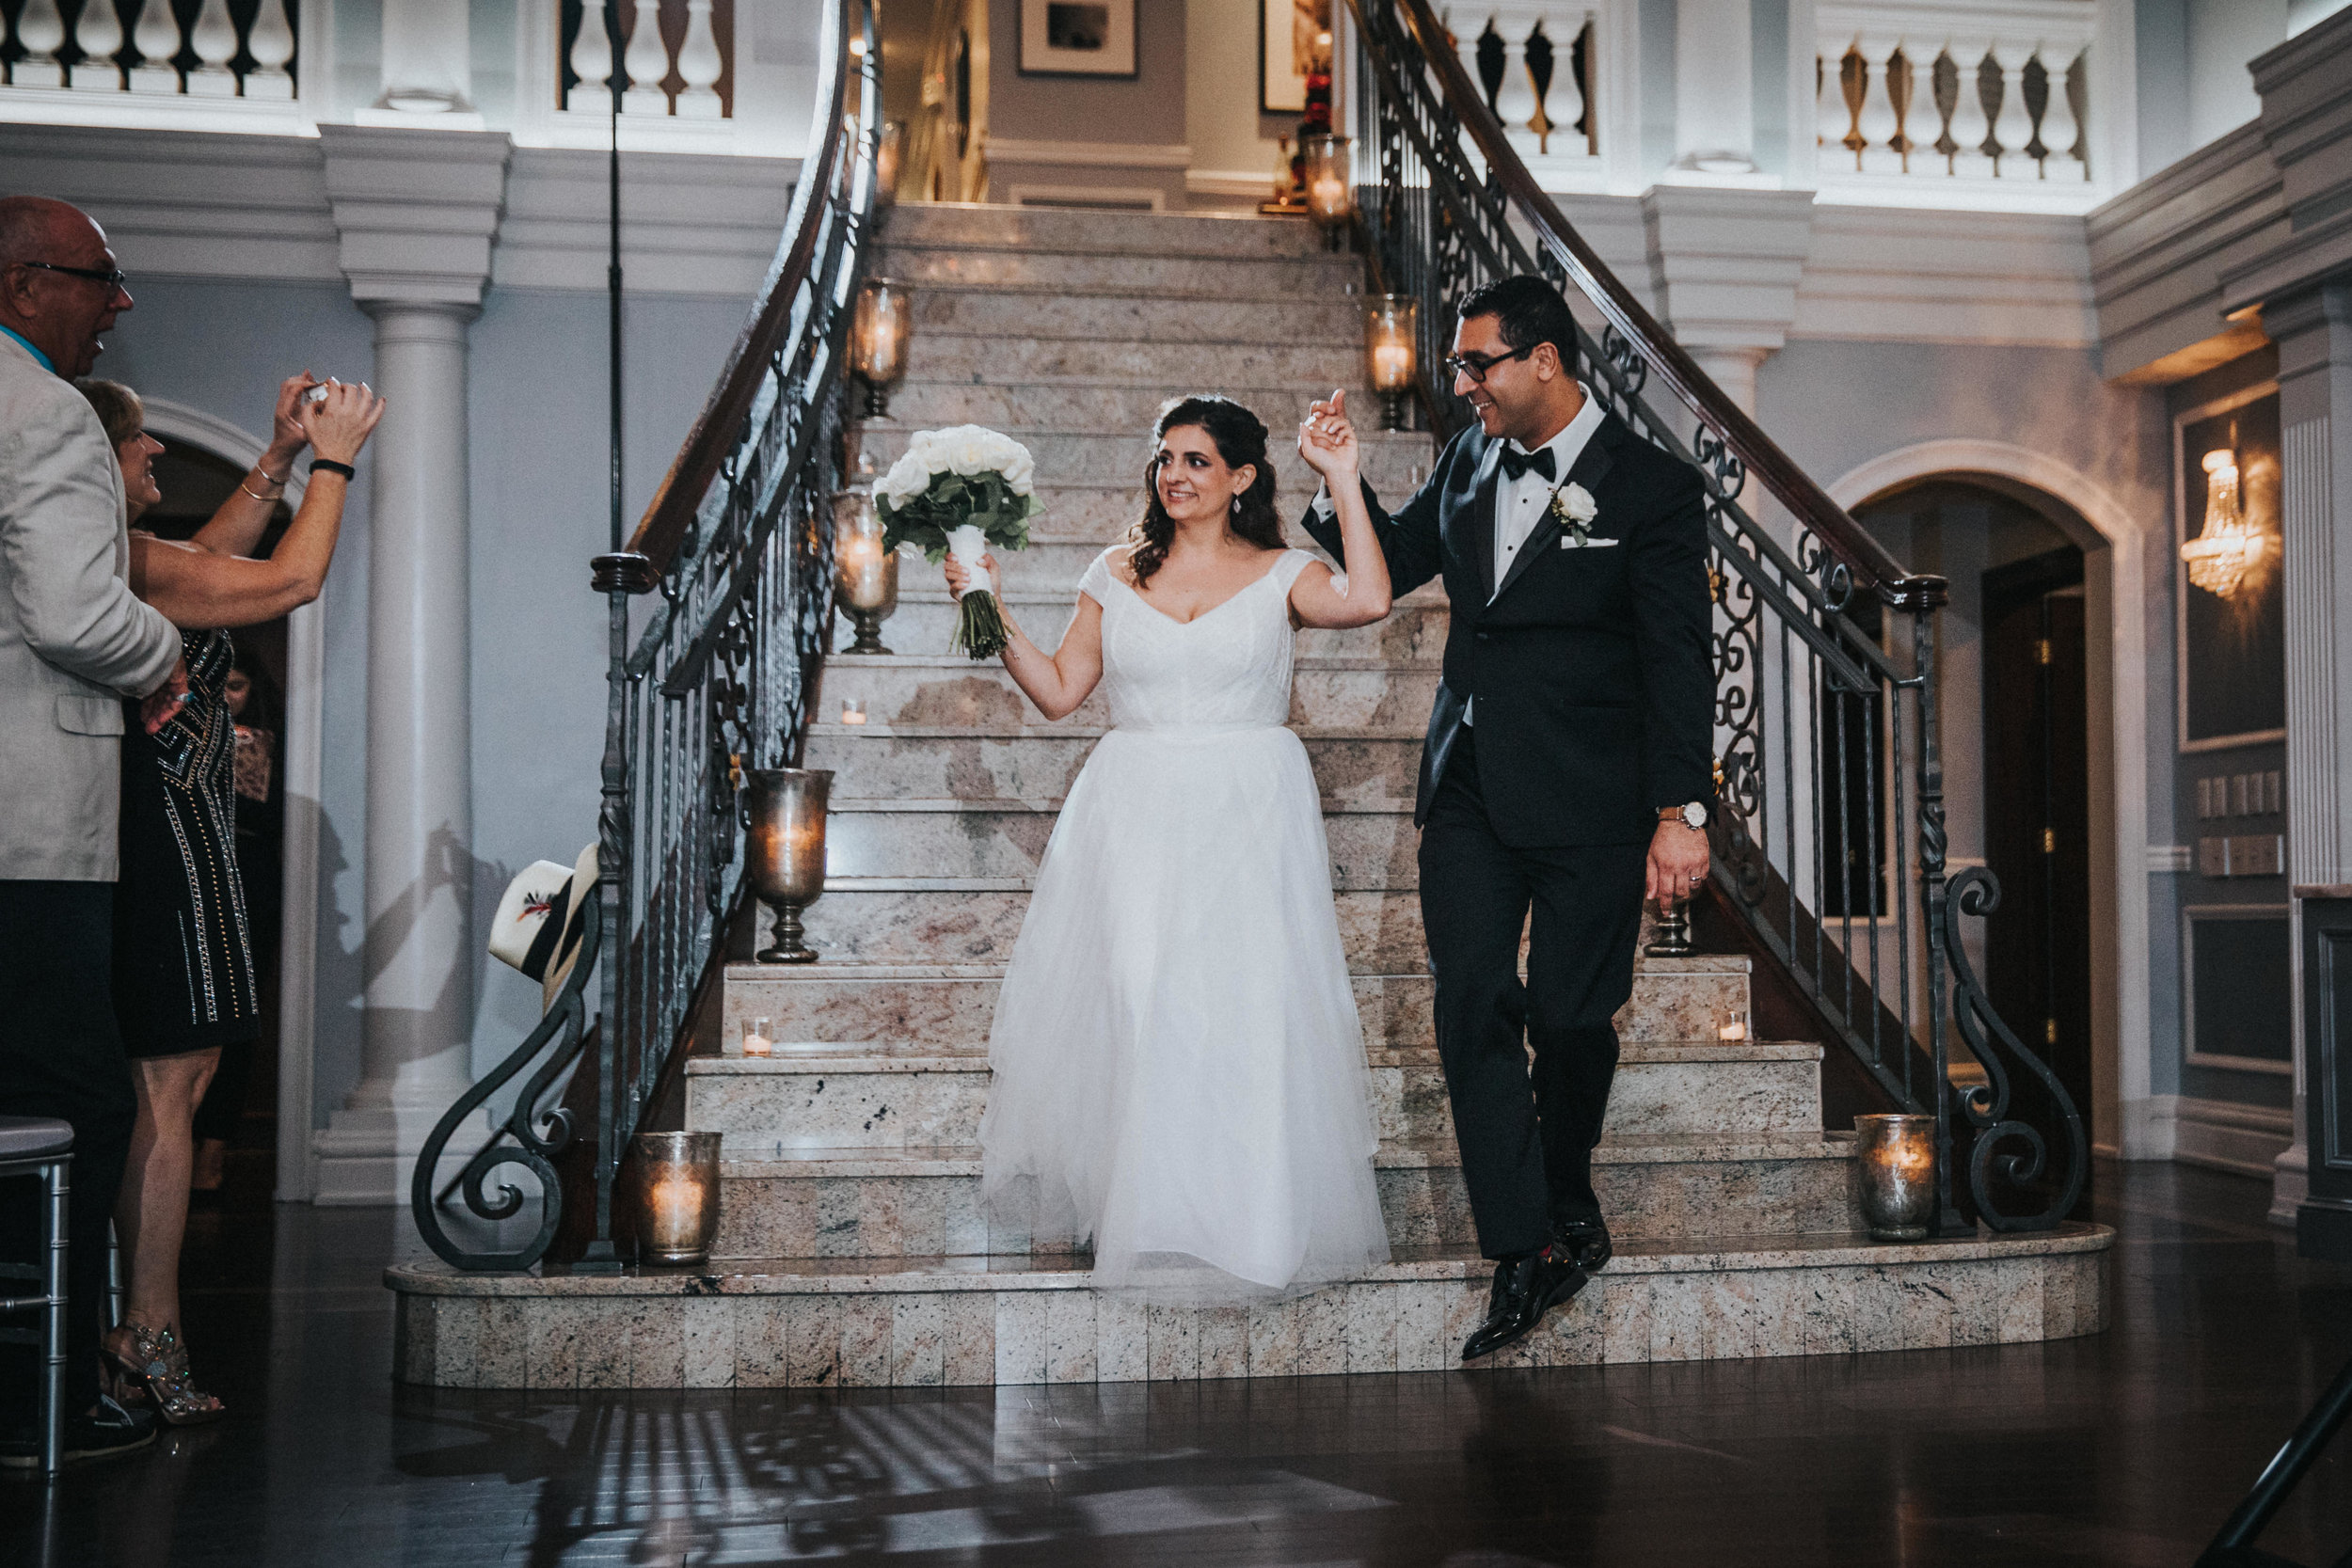 JennaLynnPhotography-NJWeddingPhotographer-Philadelphia-Wedding-ArtsBallroom-Reception-14.jpg